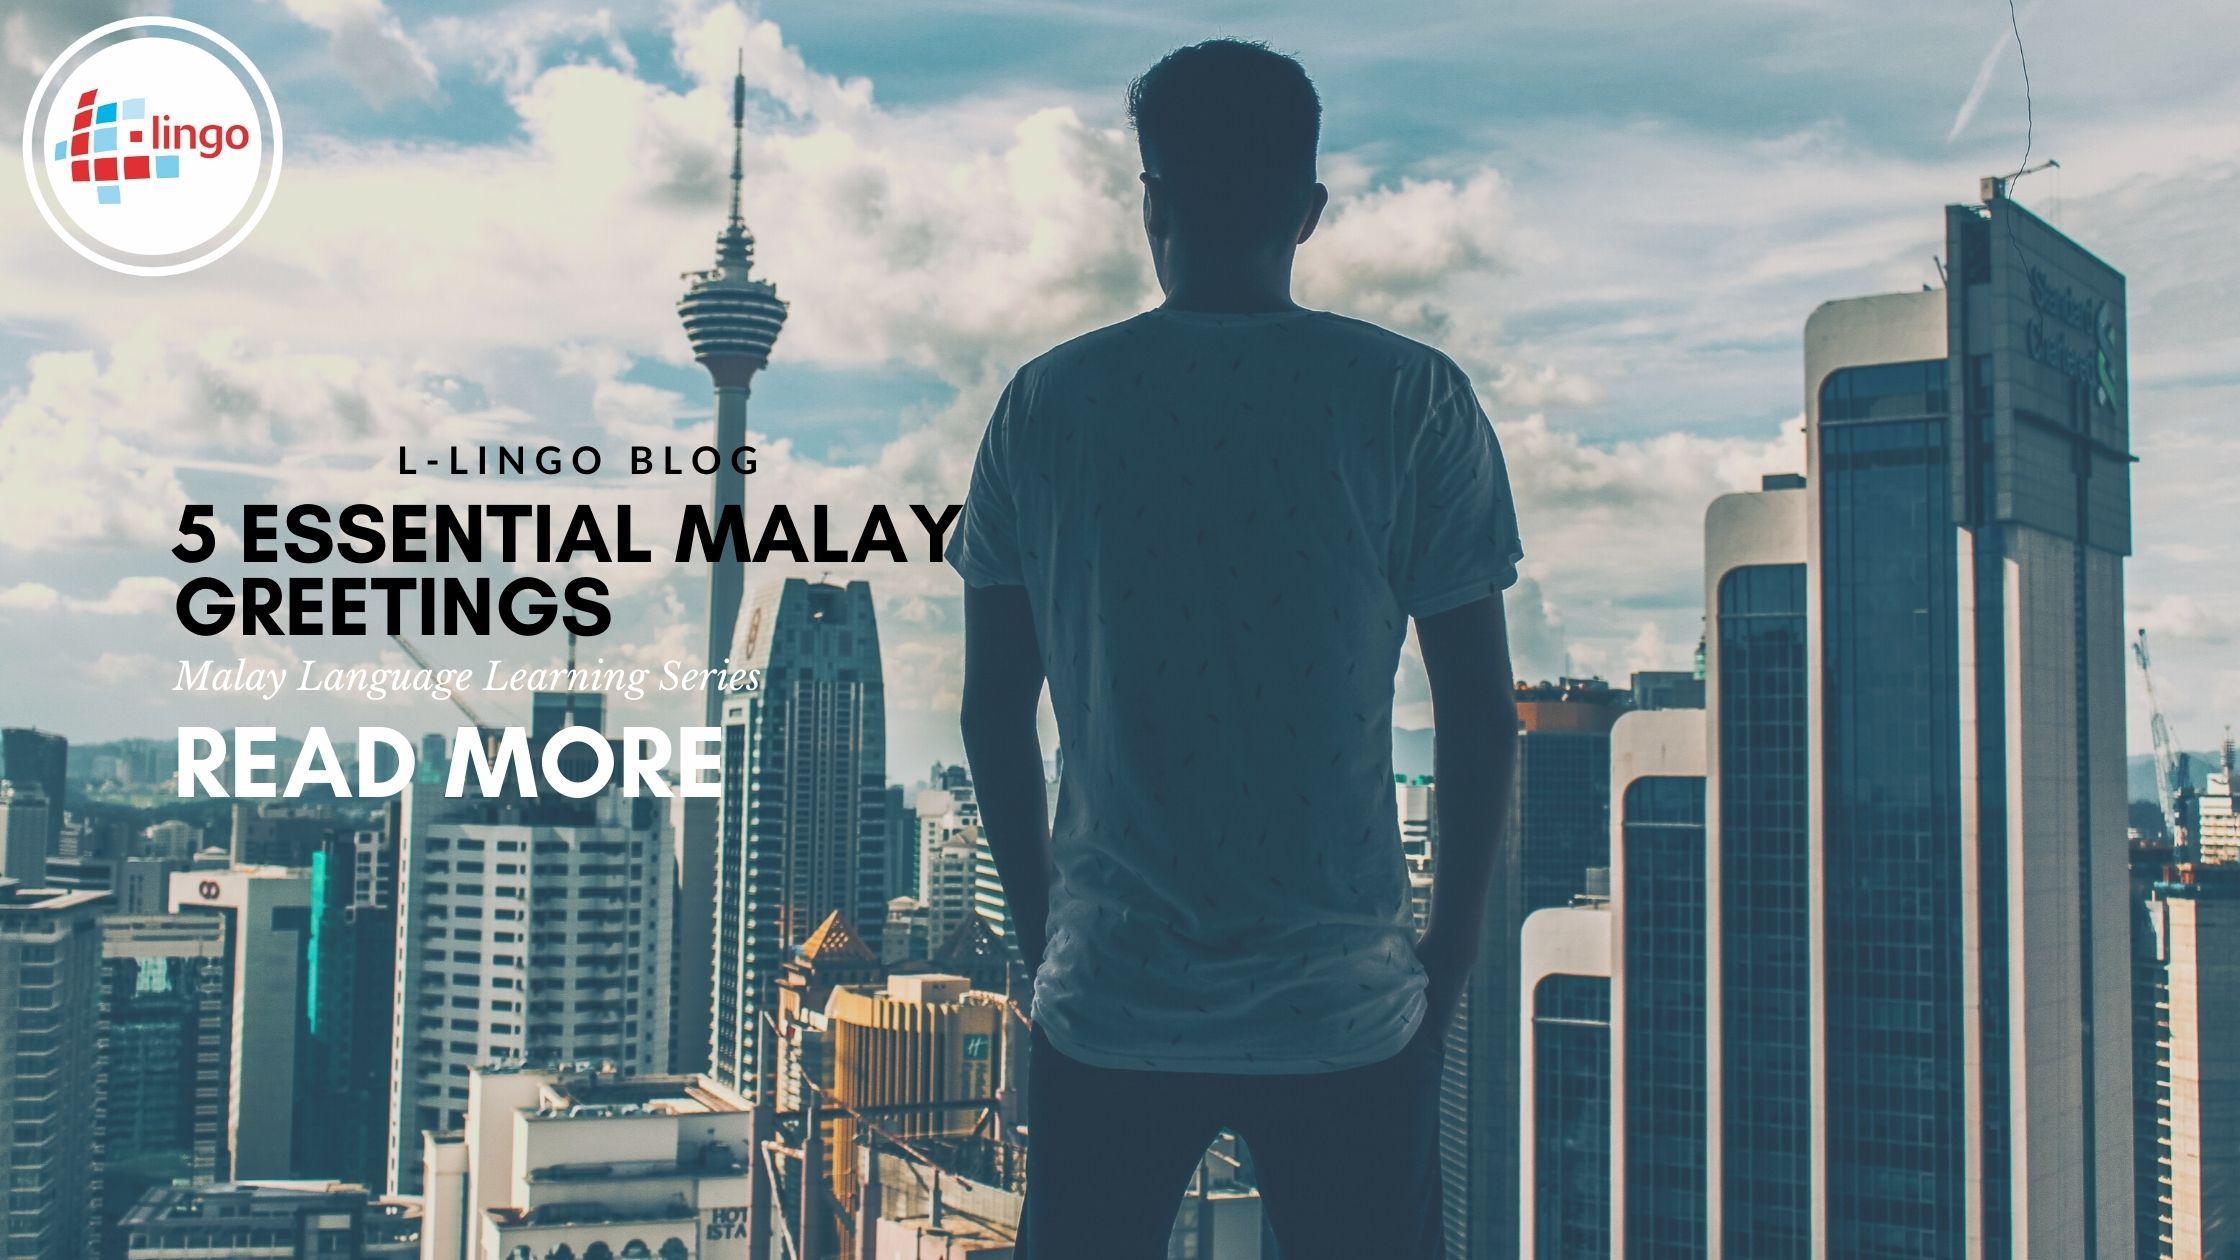 L-Lingo Learn Malay Blog